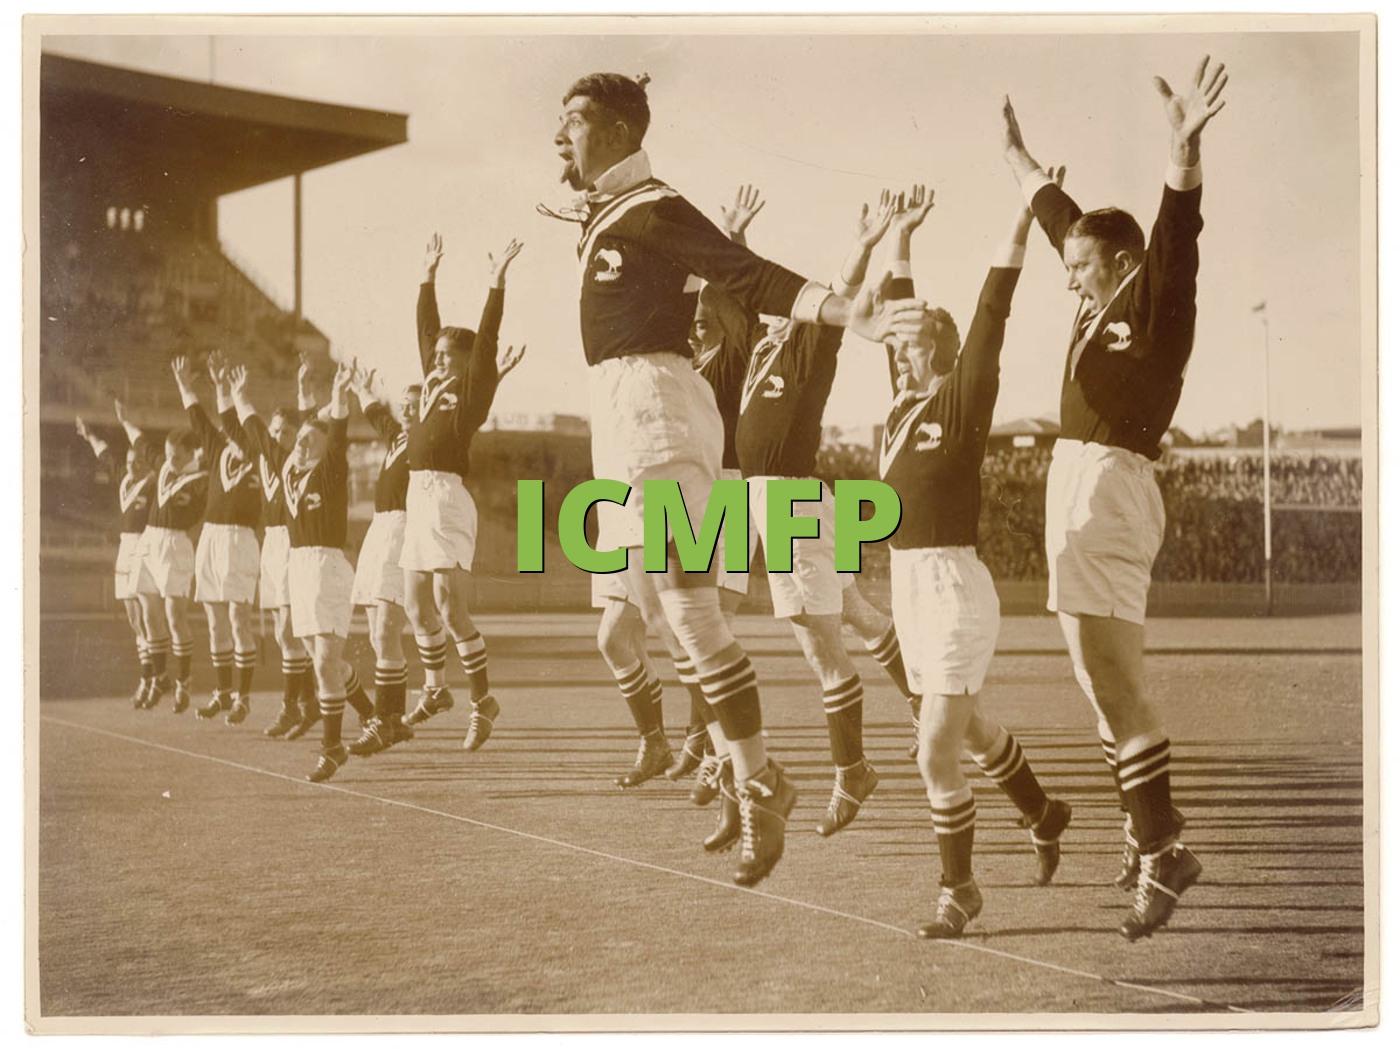 ICMFP